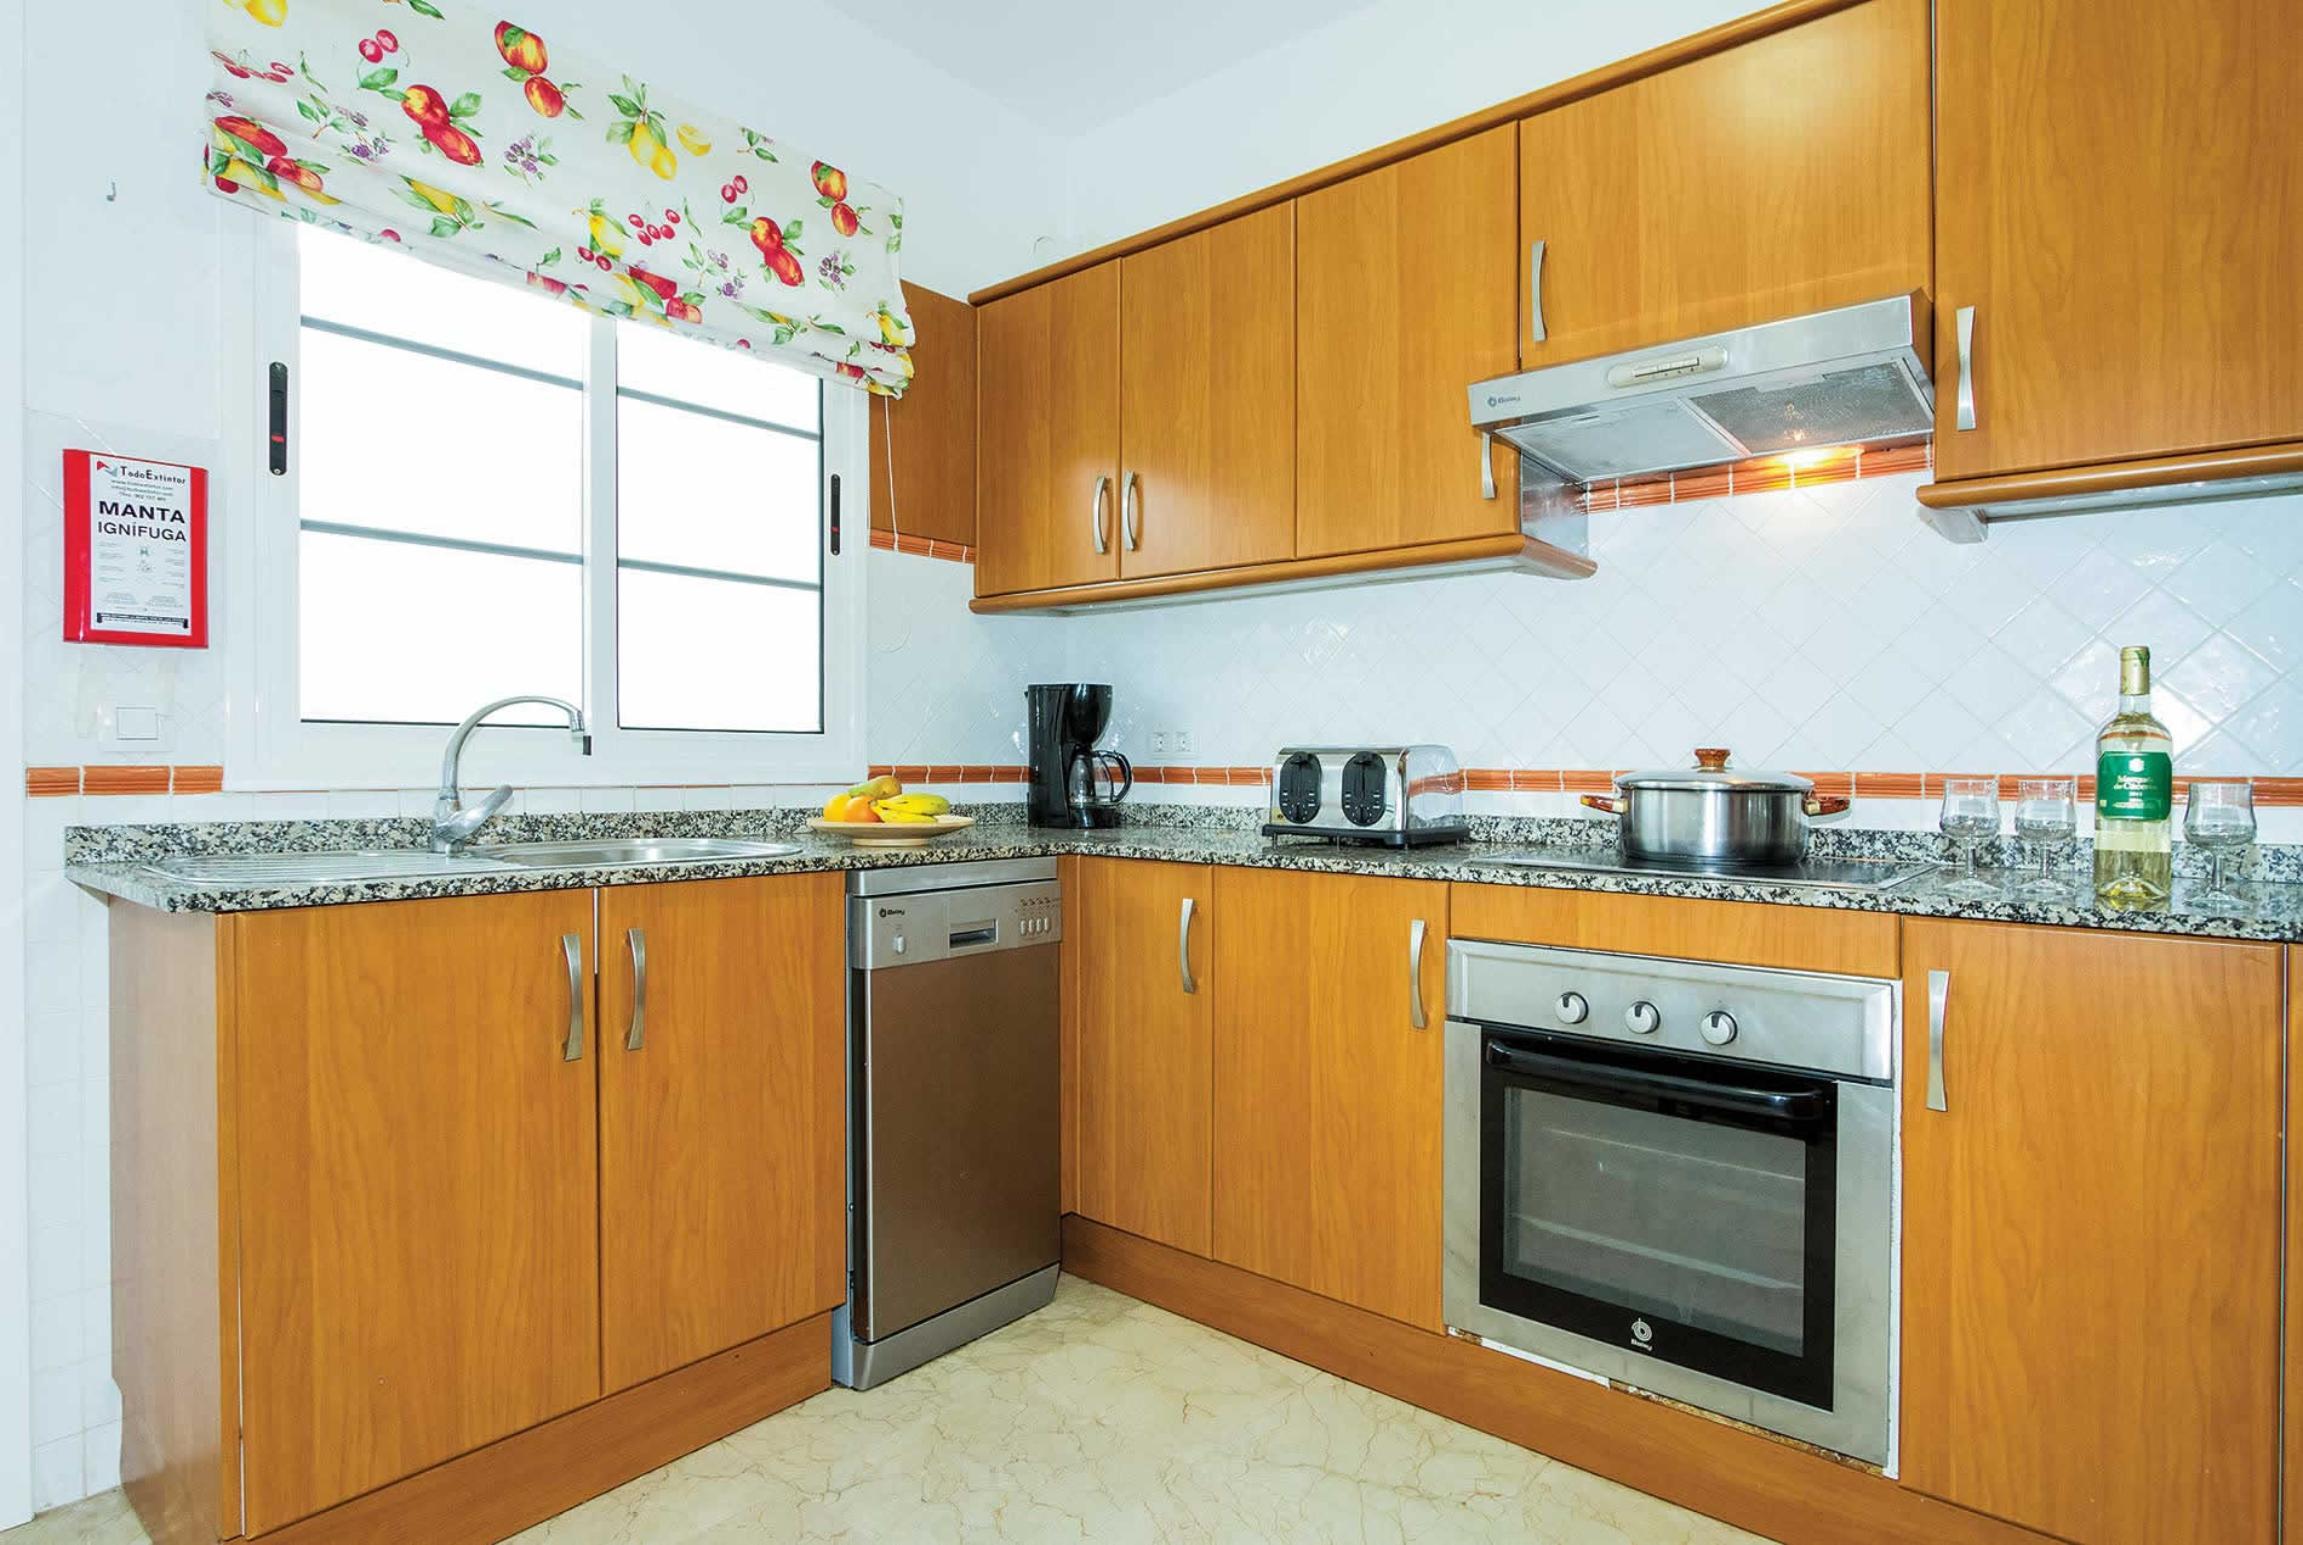 Ferienhaus Casa Candela (2654390), Puerto del Carmen, Lanzarote, Kanarische Inseln, Spanien, Bild 4